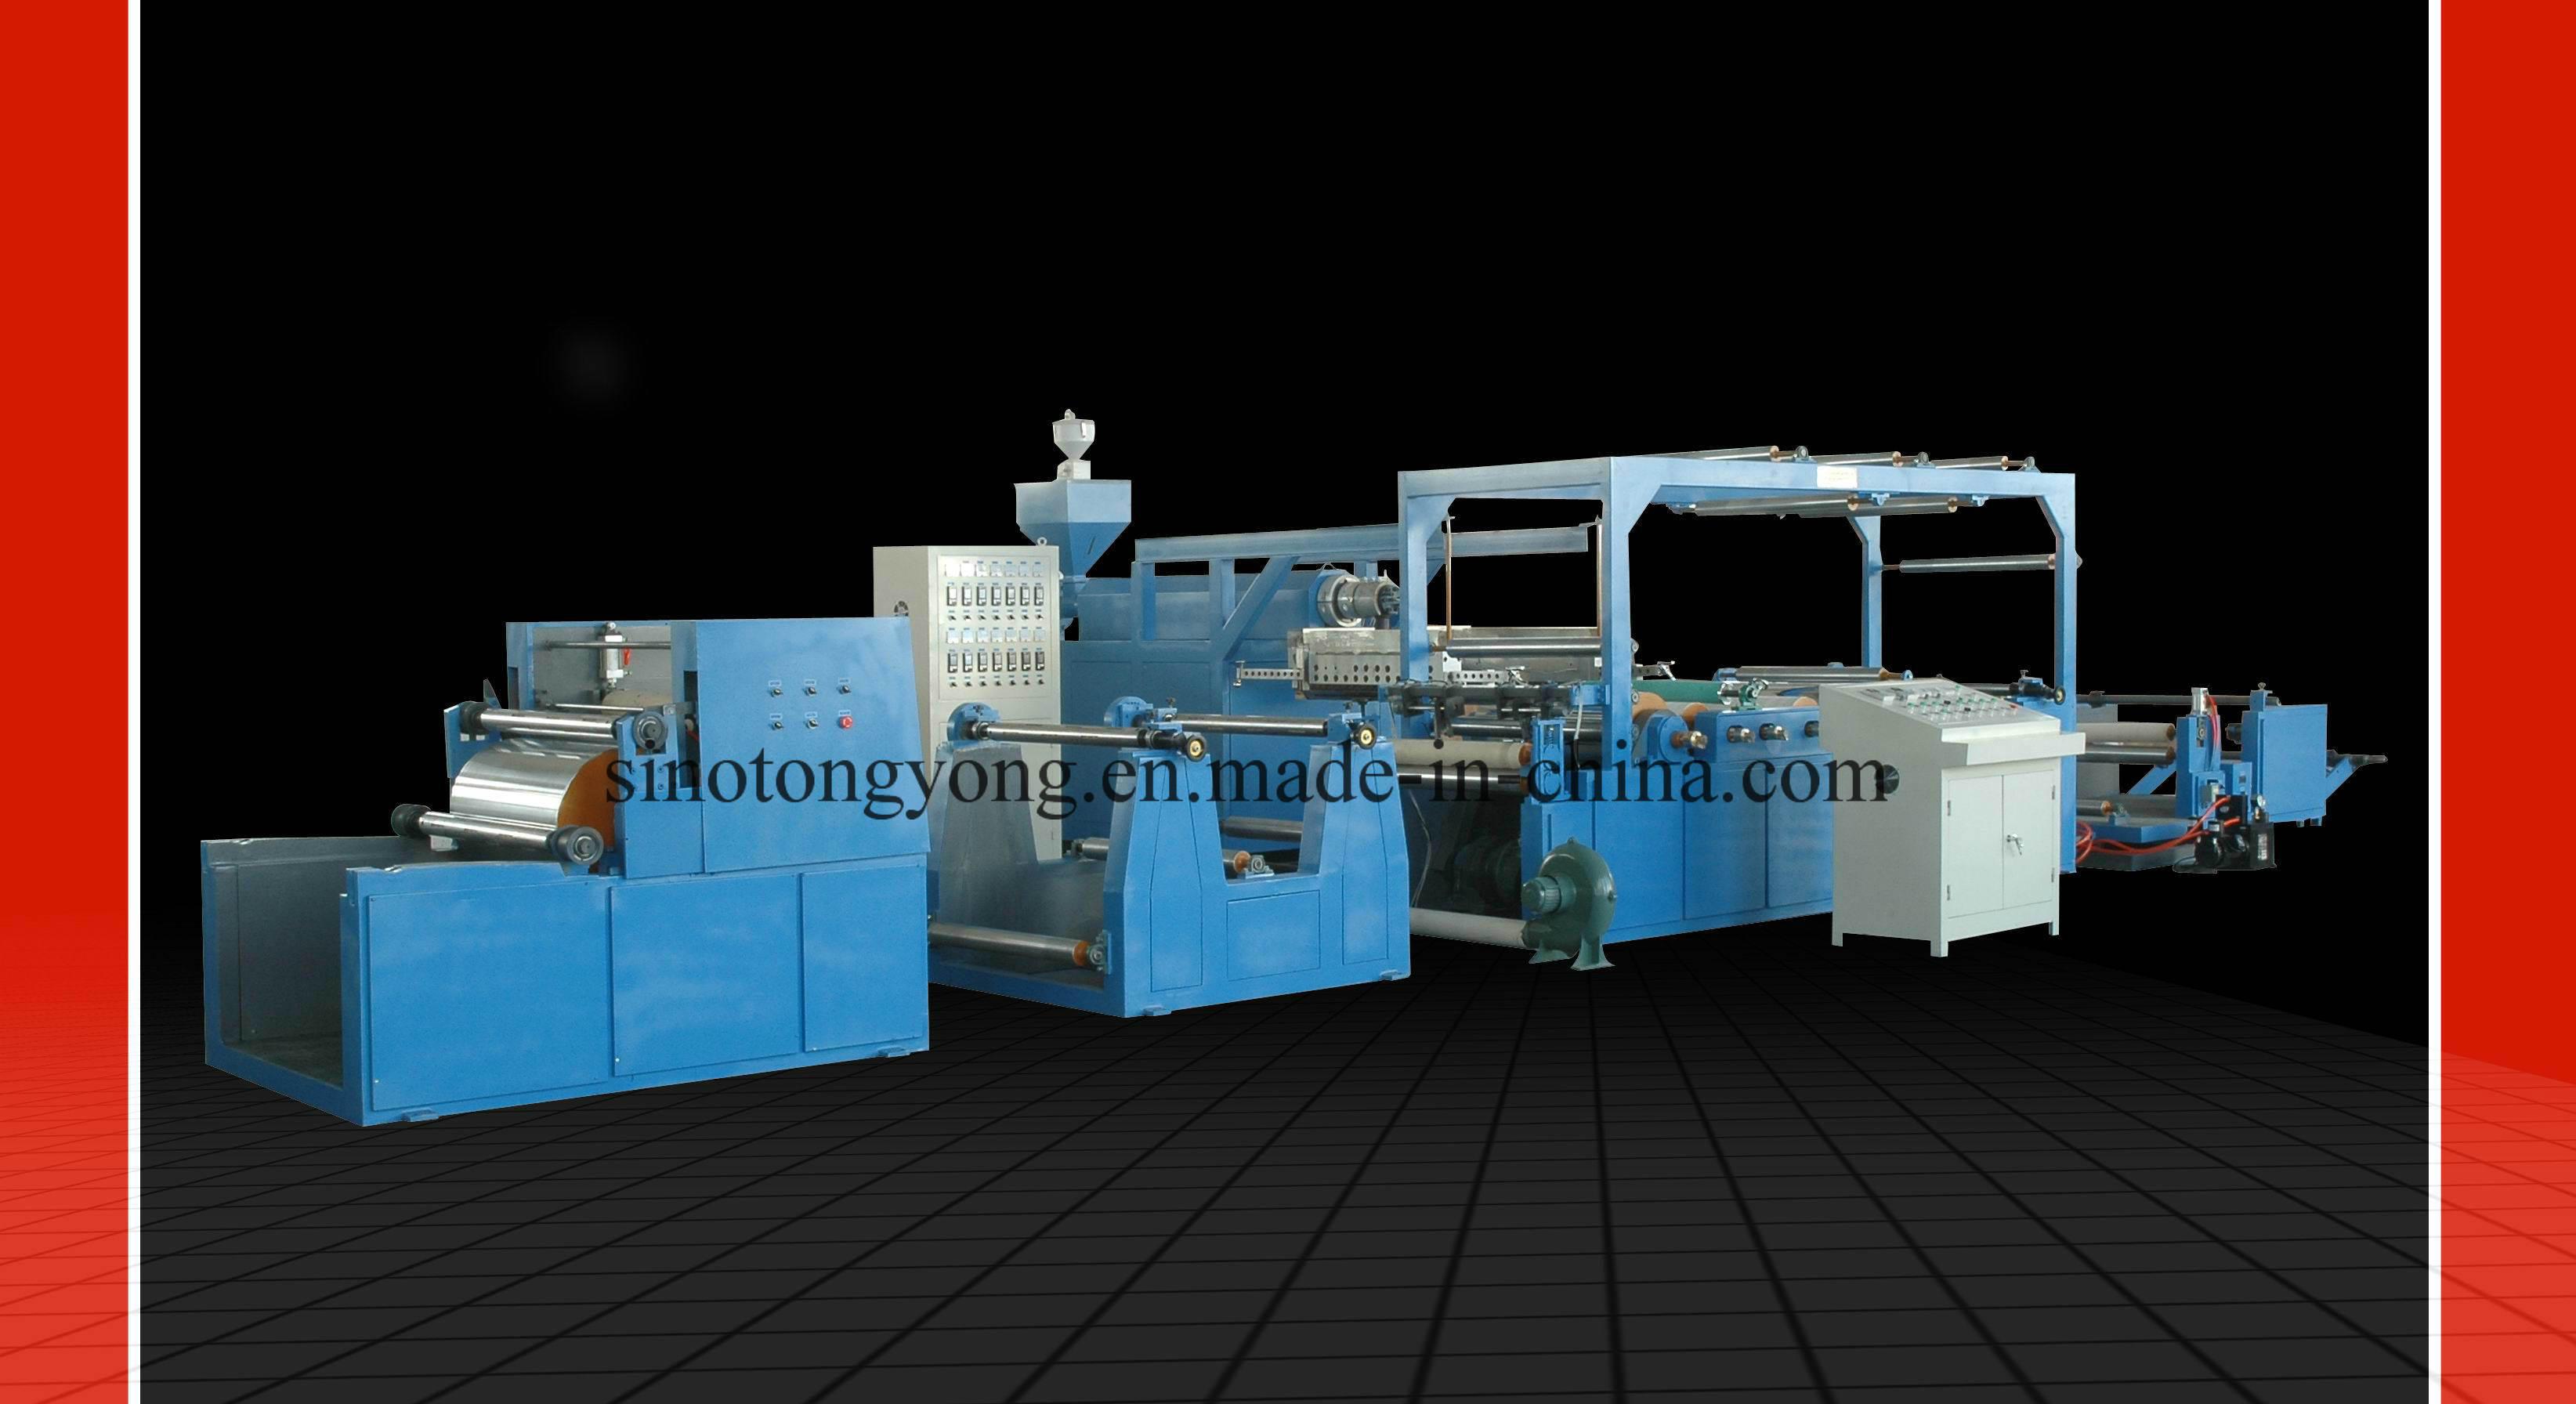 Plastic Film Laminating Machine for PP Woven Bags (Sj-Fmz Series)